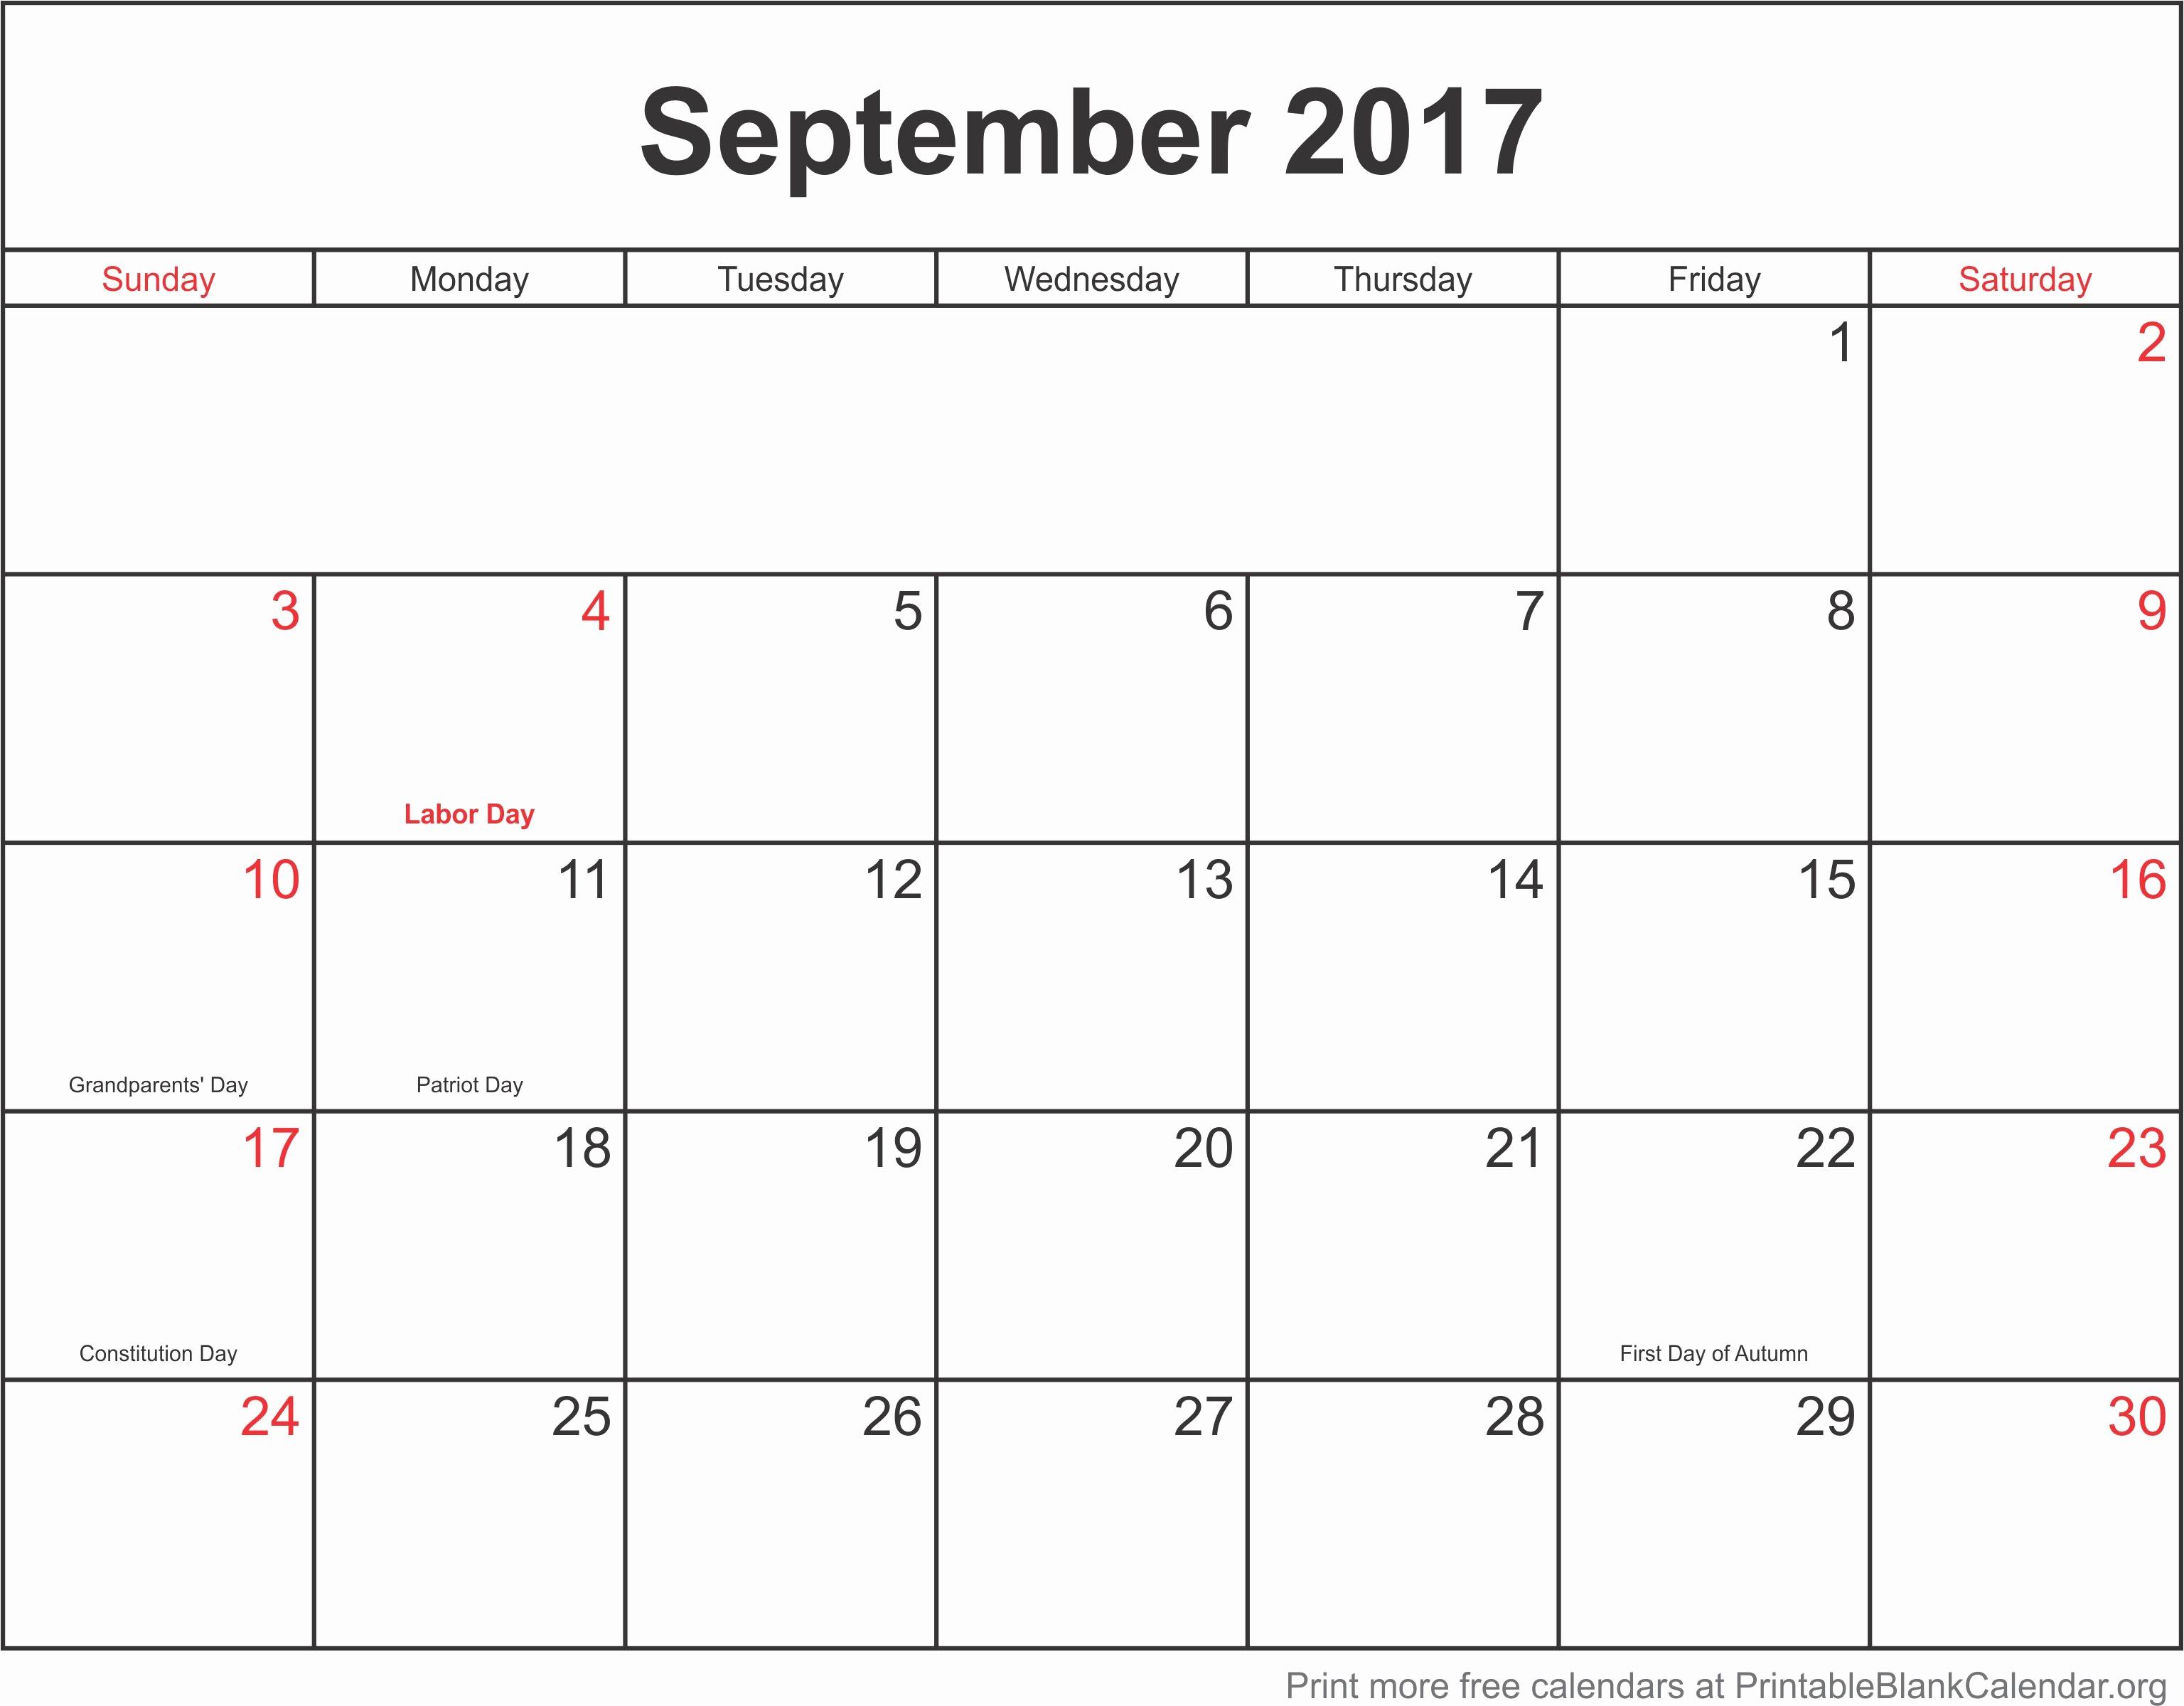 Free Printable Quarterly Calendar 2017 Luxury Printable Monthly Calendar 2017